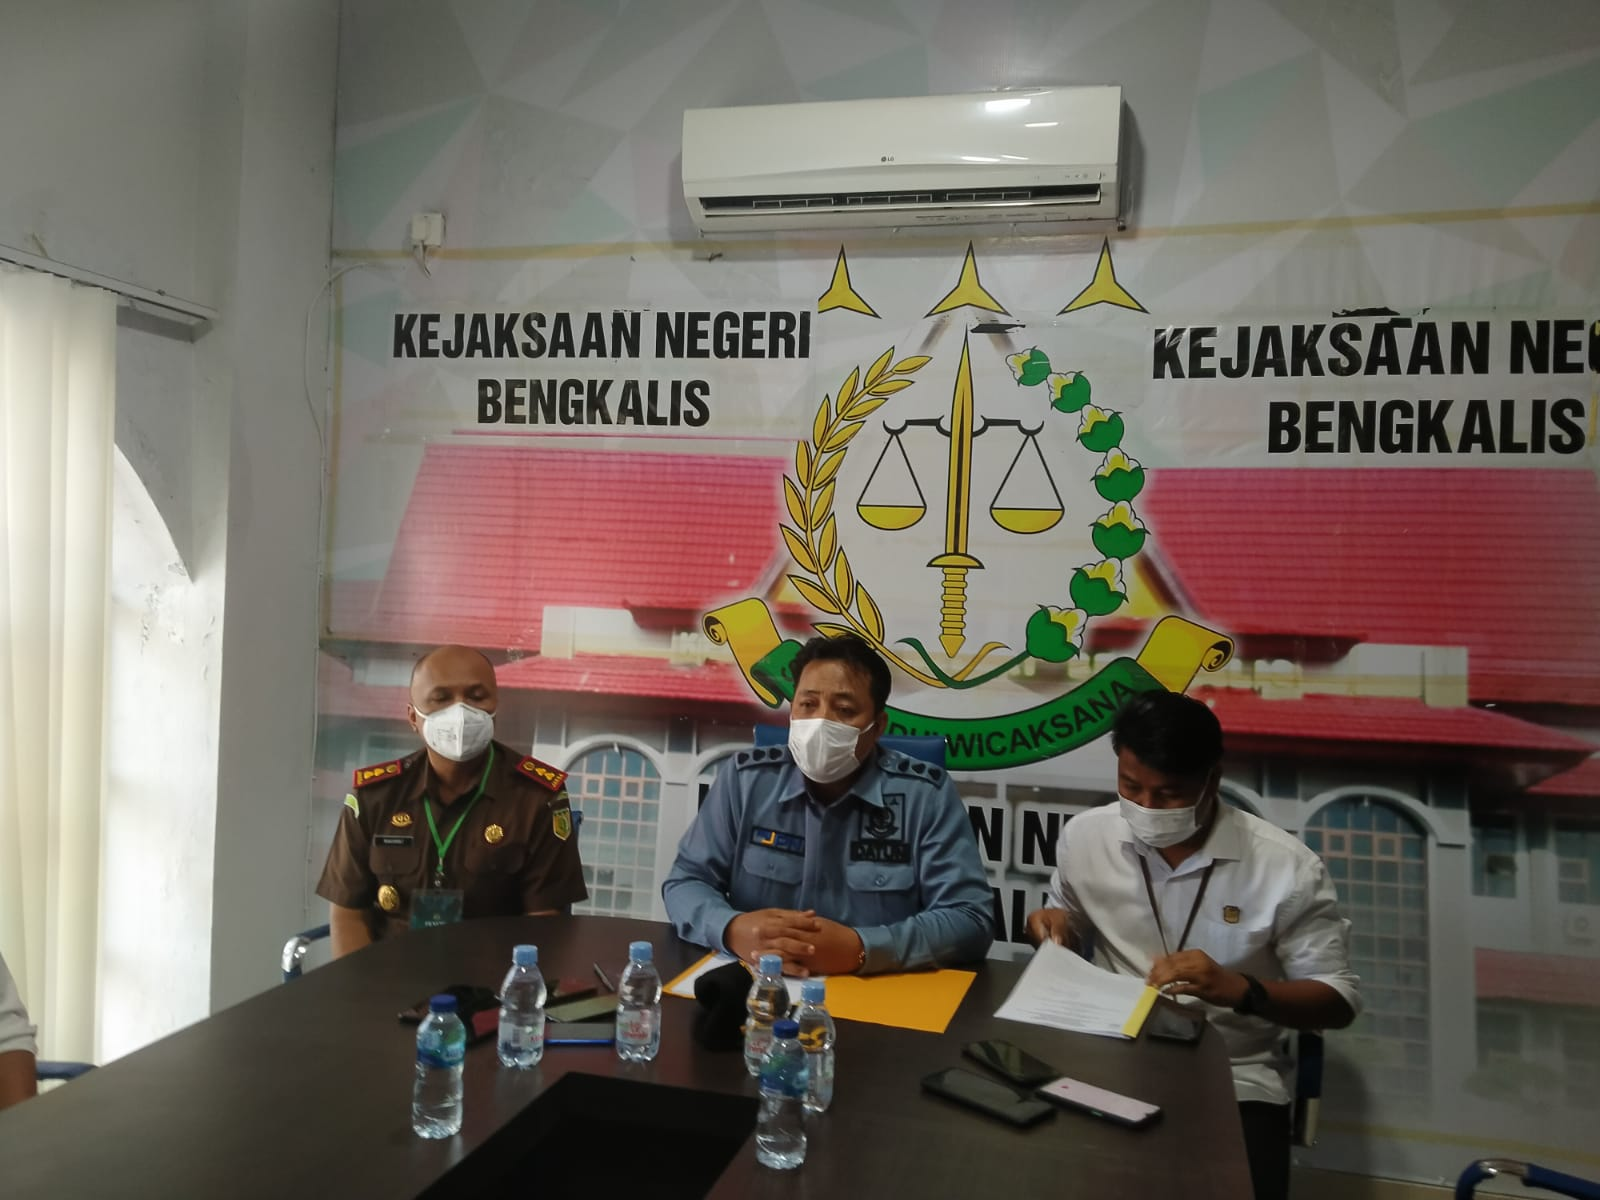 9 Jaksa Wakili Negara Sebagai Tergugat Sengketa Lahan PT CPI